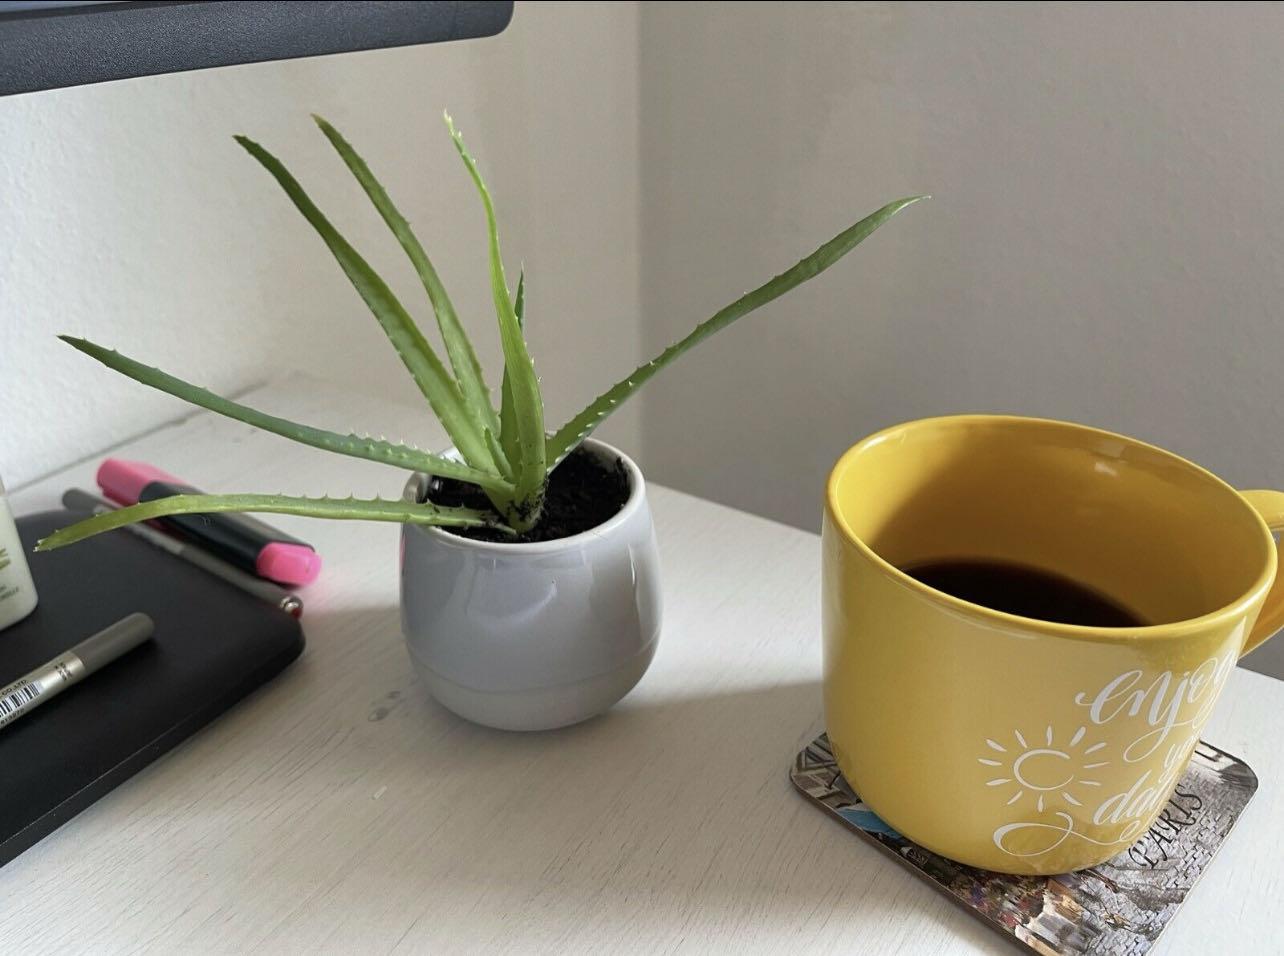 Aloe Vera Zimmerpflanze inkl. Keramik Topf